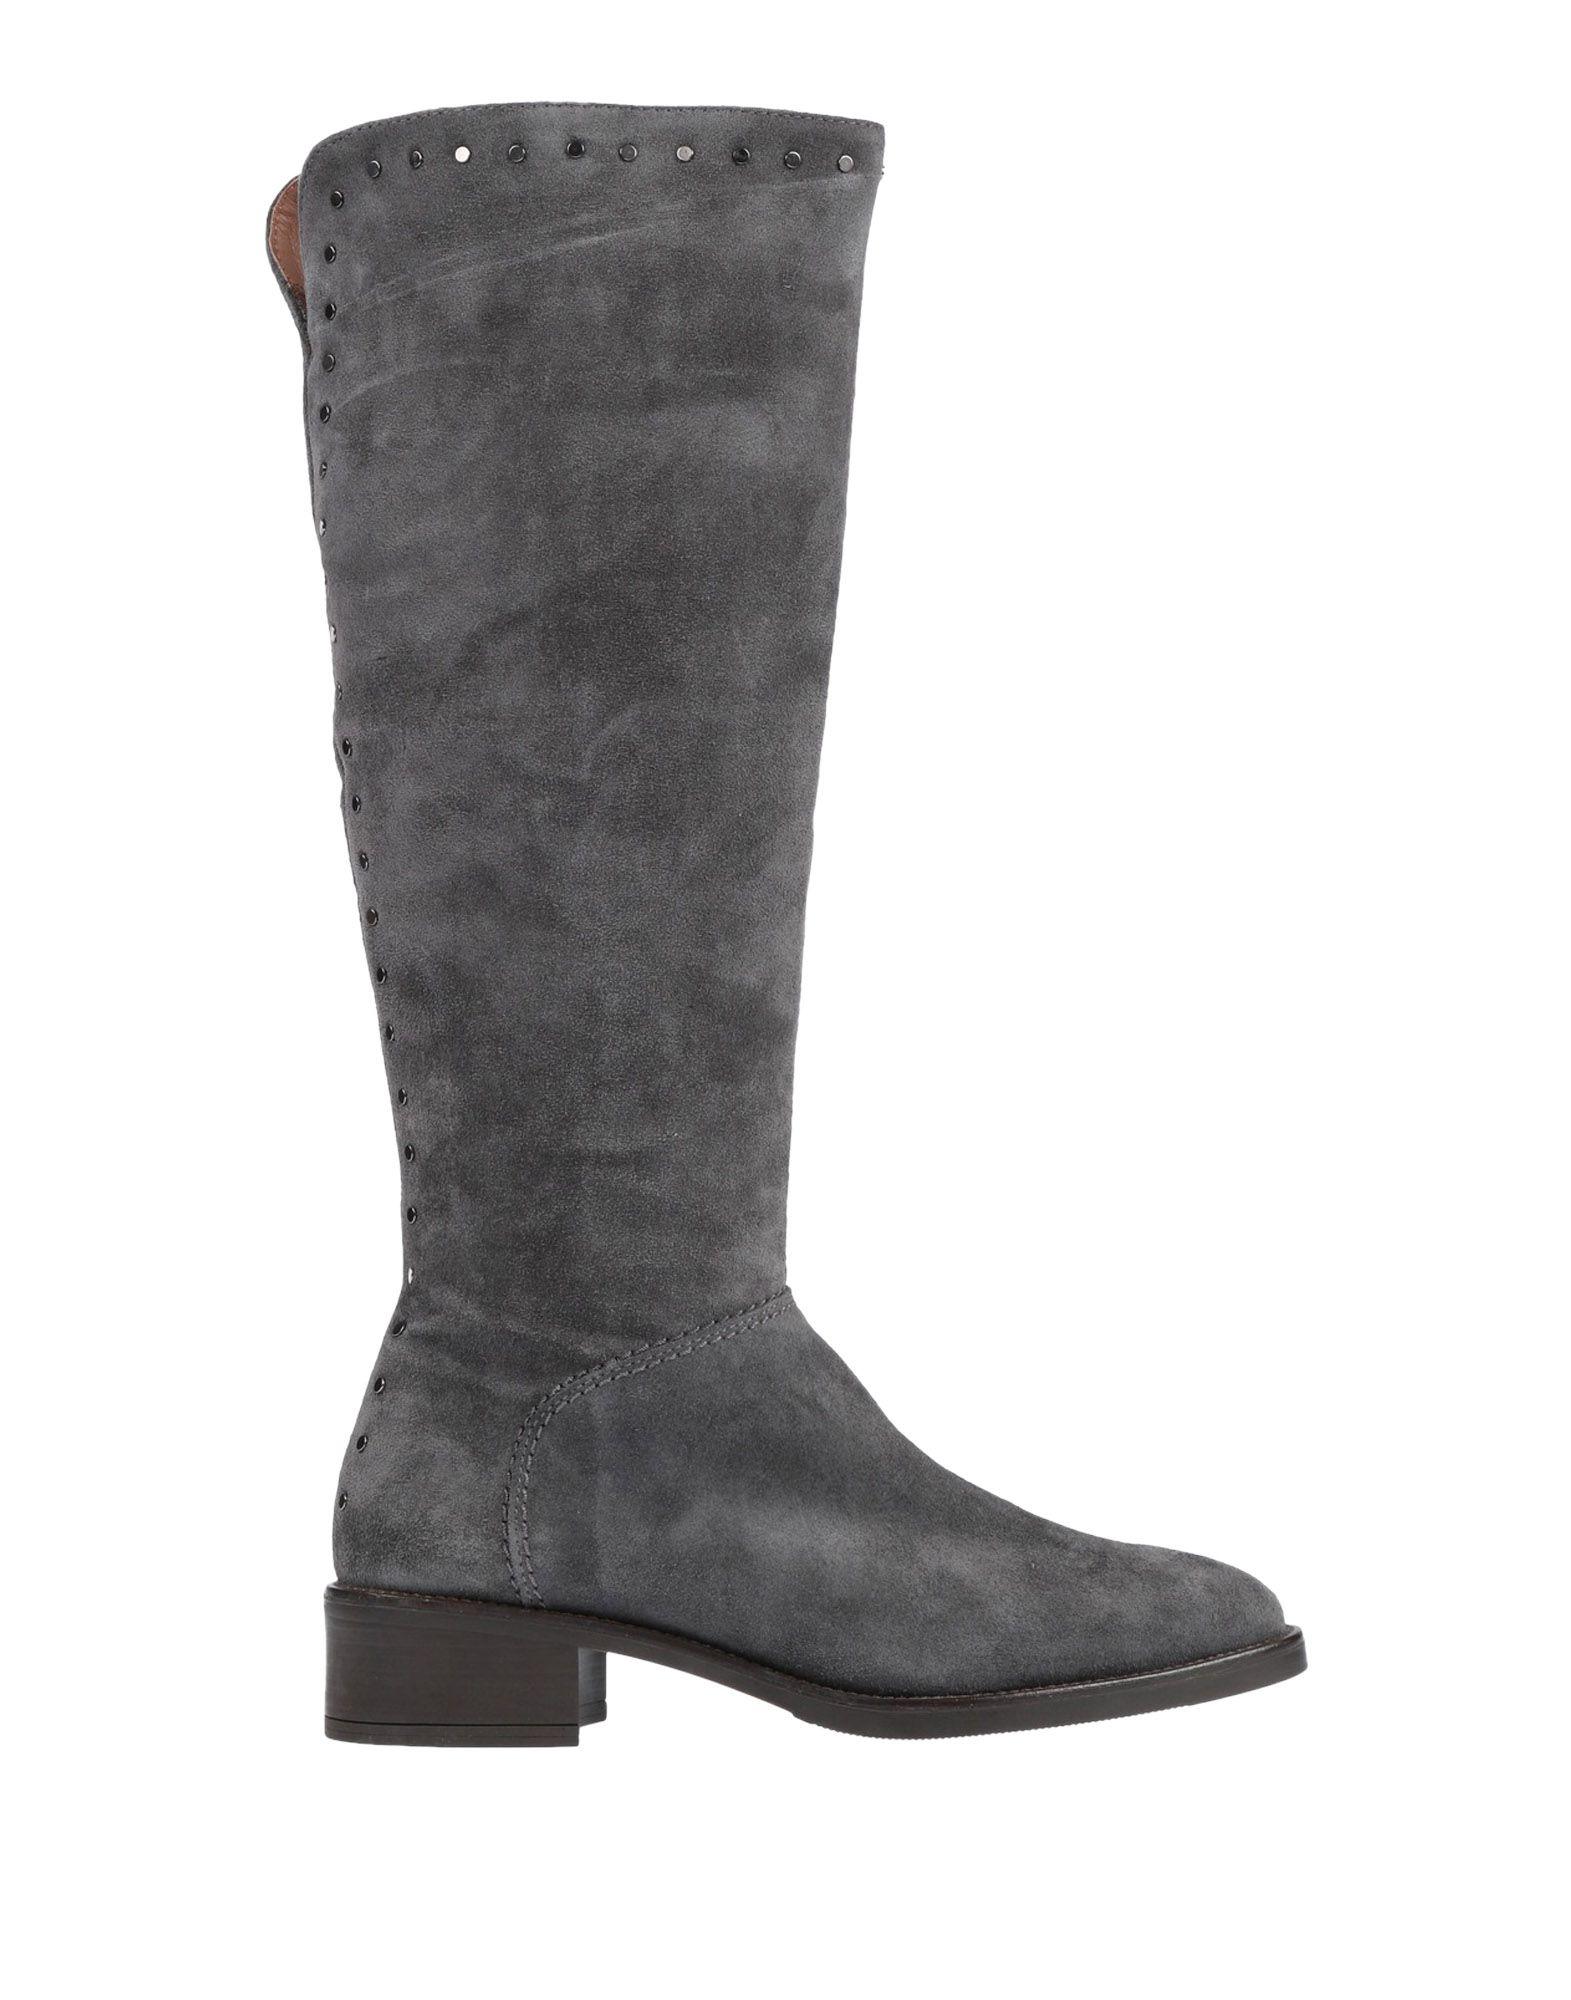 Alpe Woman Schuhes Gute Stiefel Damen 11526745KN Gute Schuhes Qualität beliebte Schuhe 5f0c93